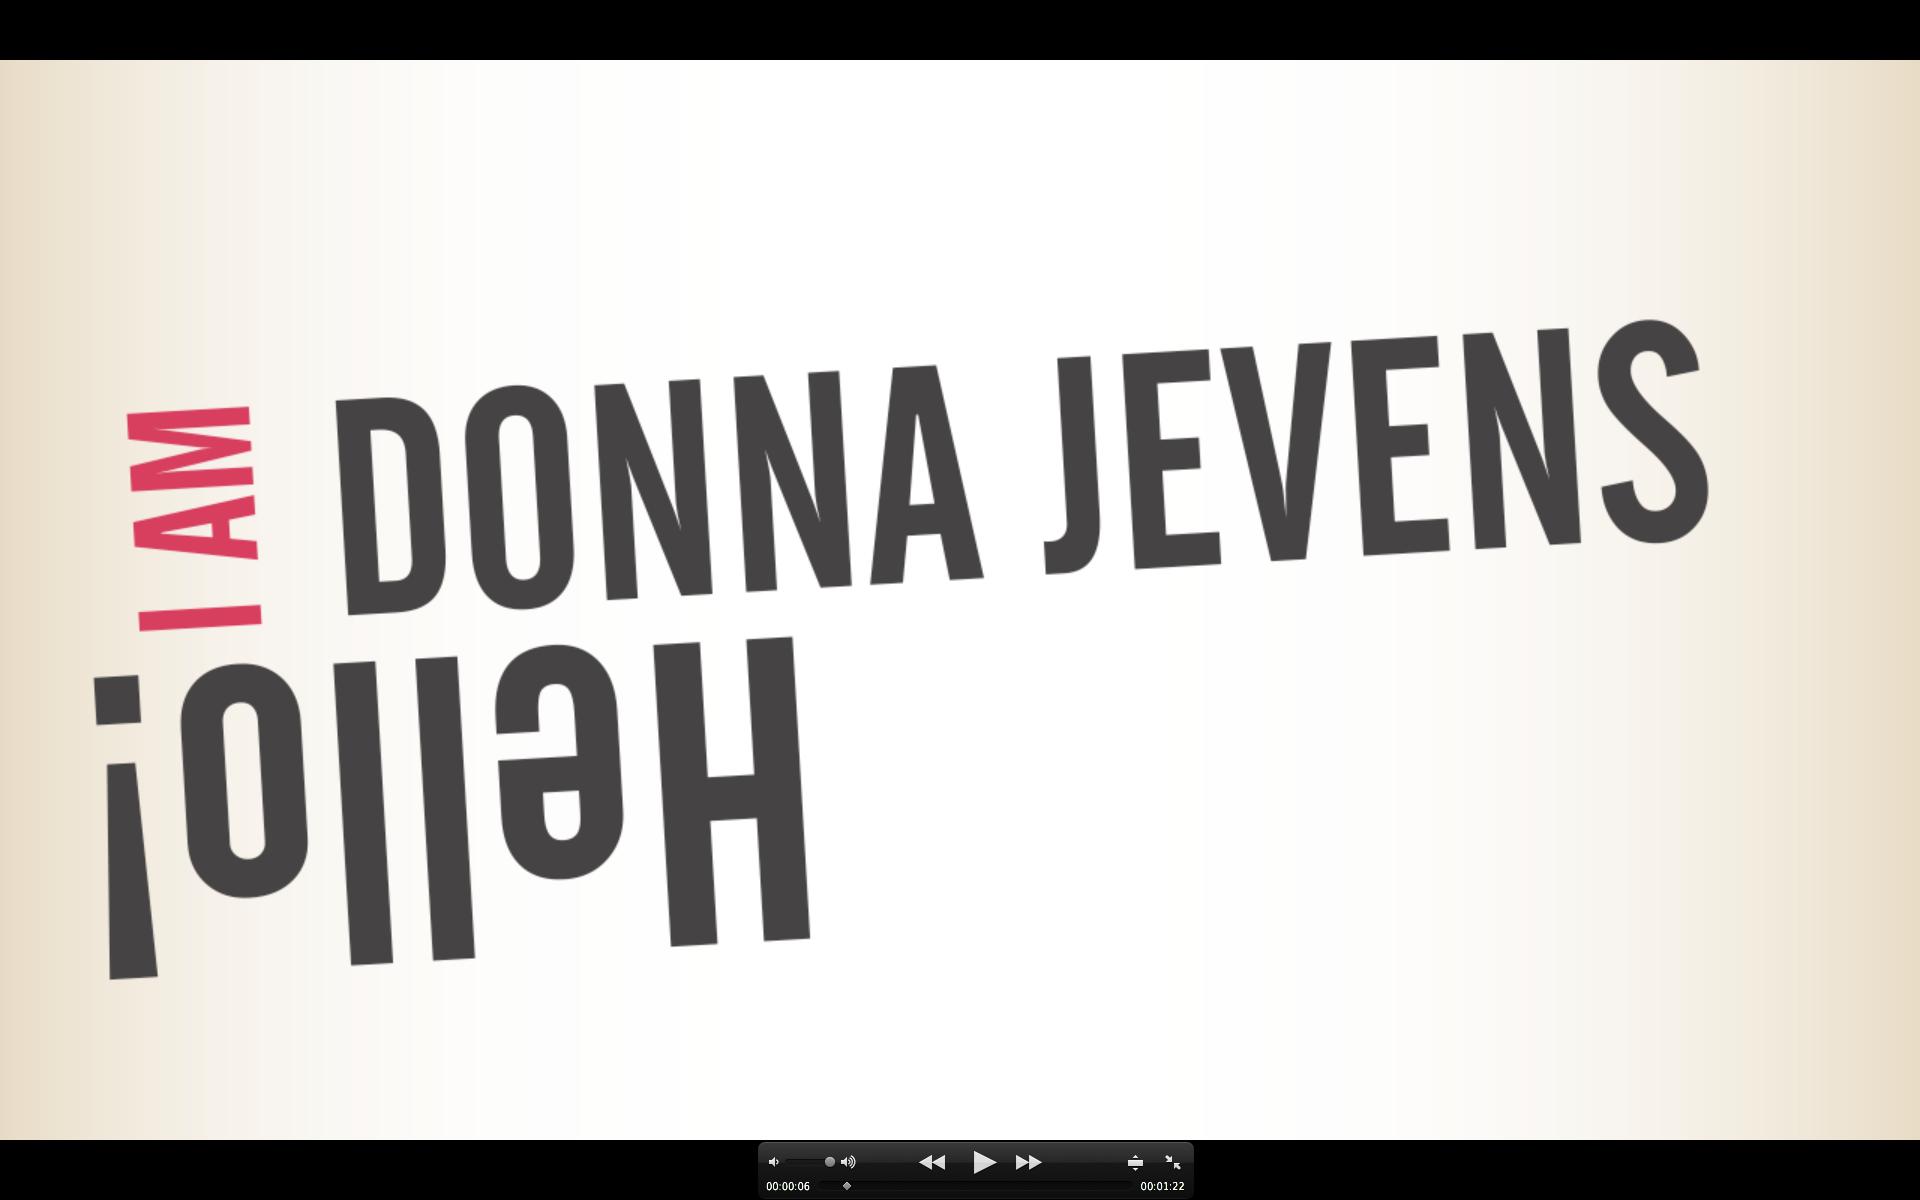 Donna Jevens Graphic Design Portfolio - Donna Jevens Motion Graphics CV